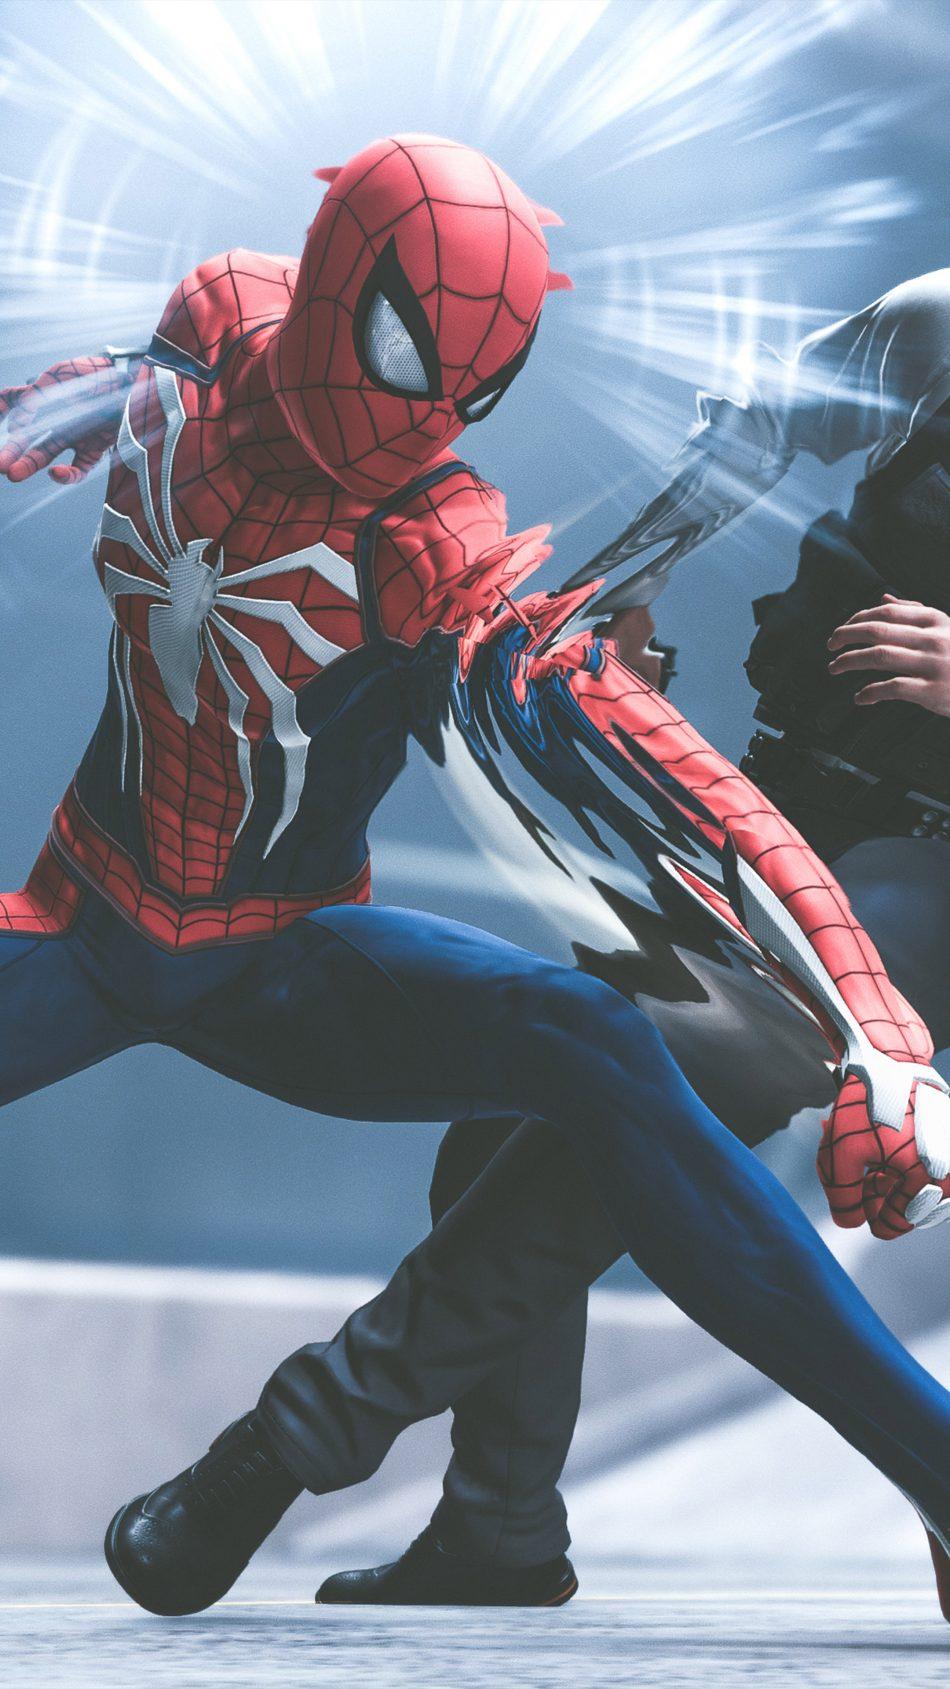 Spider Man Playstation 4 Video Game 4k Ultra Hd Mobile Wallpaper